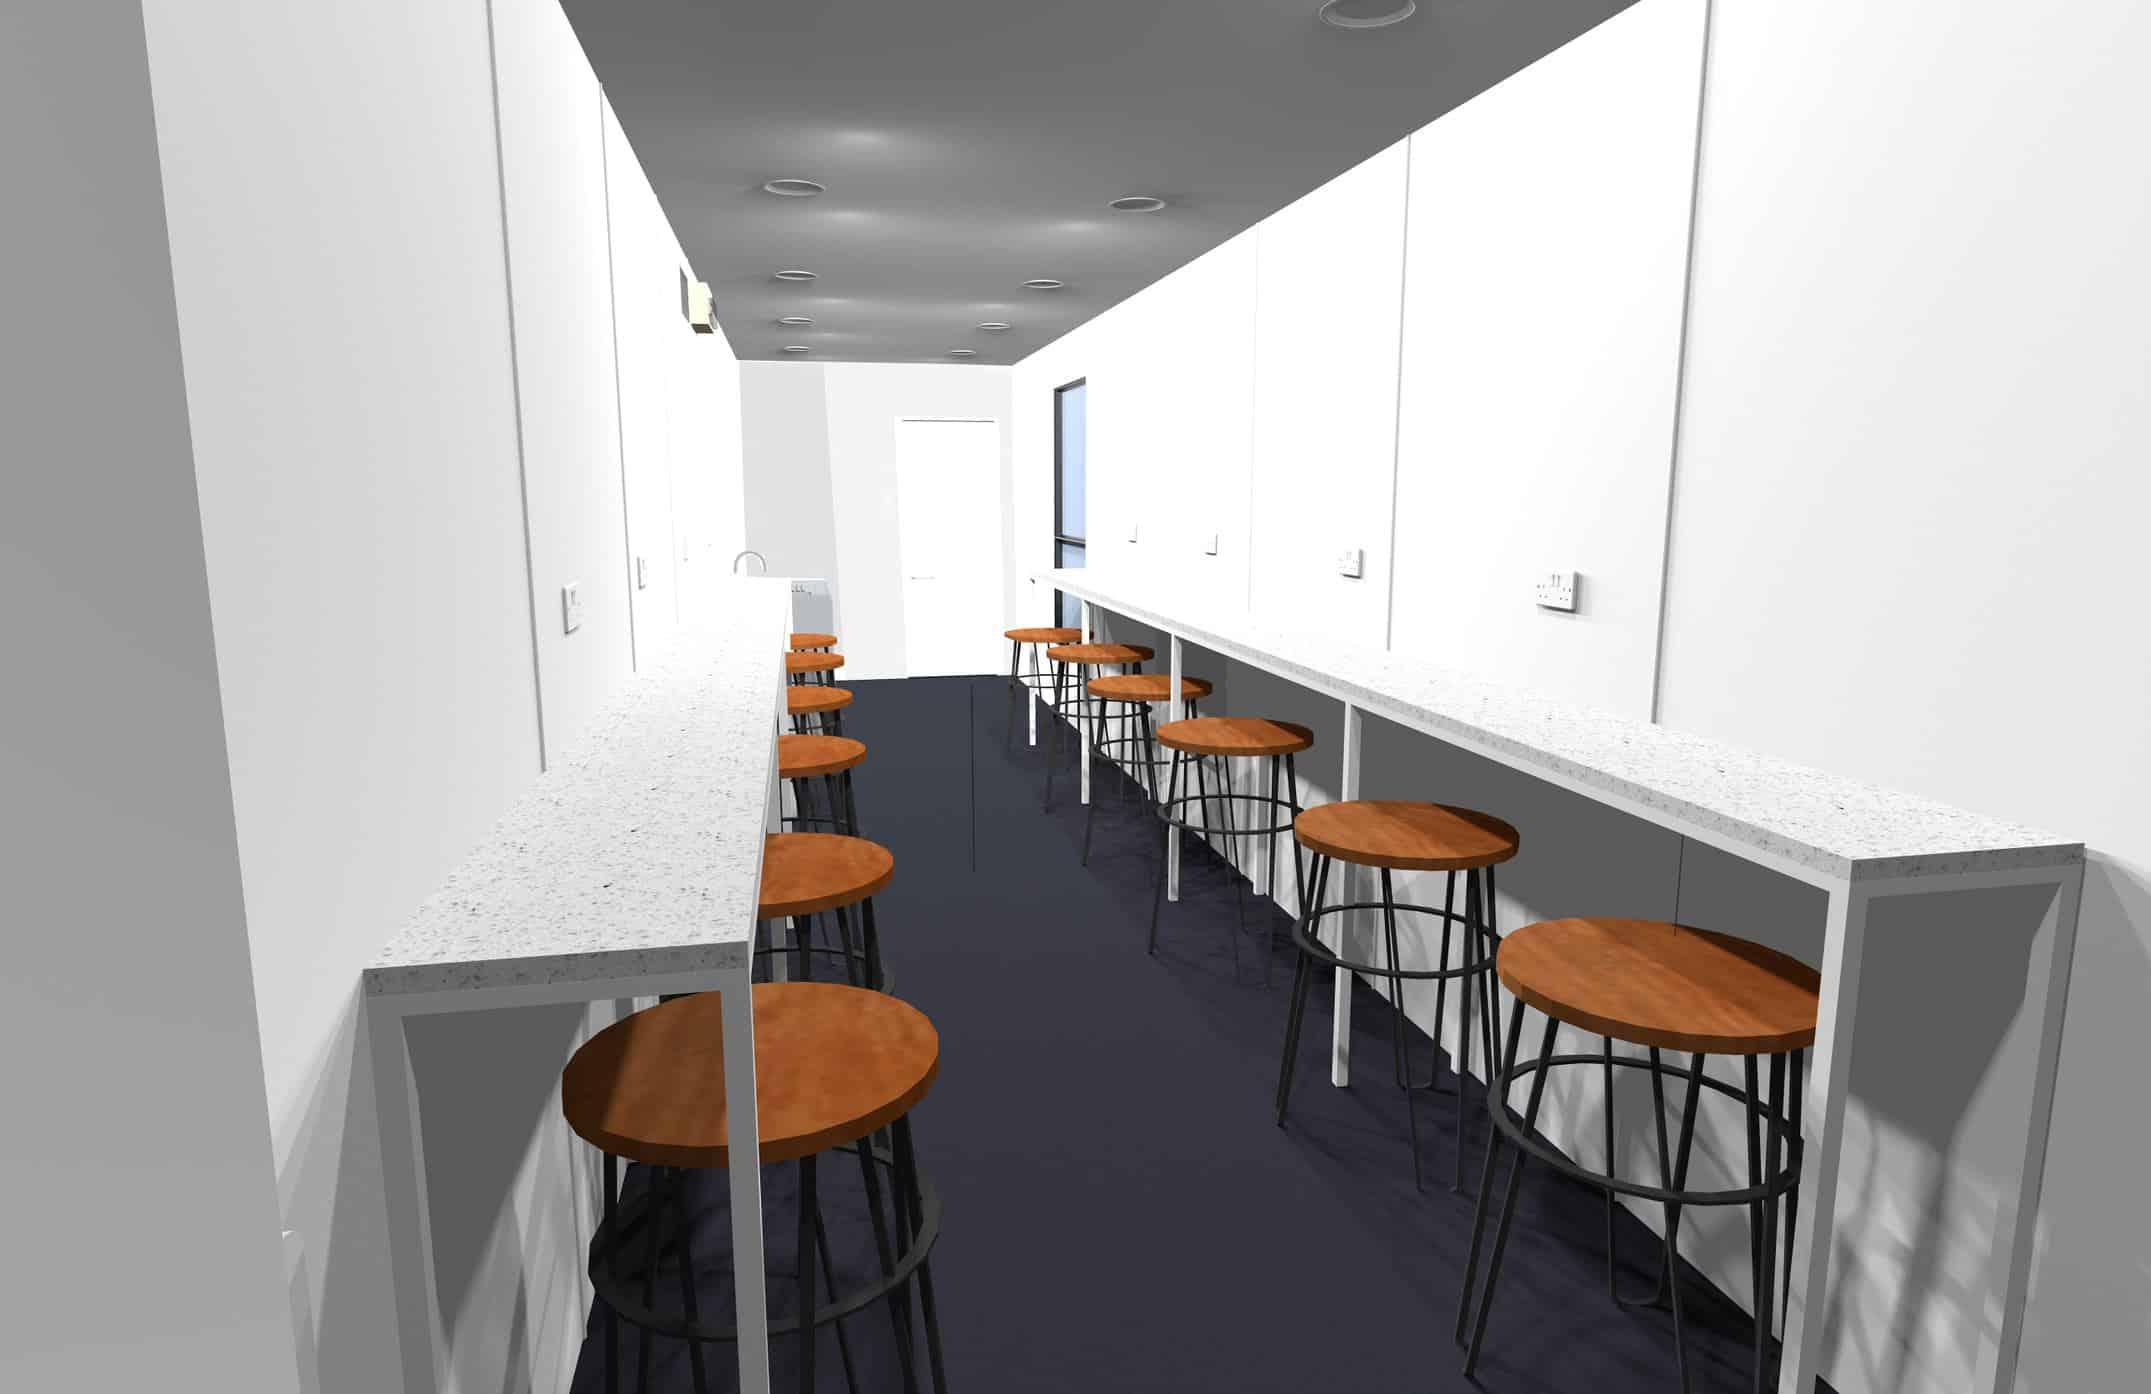 Concept design of shipping container conversion interior